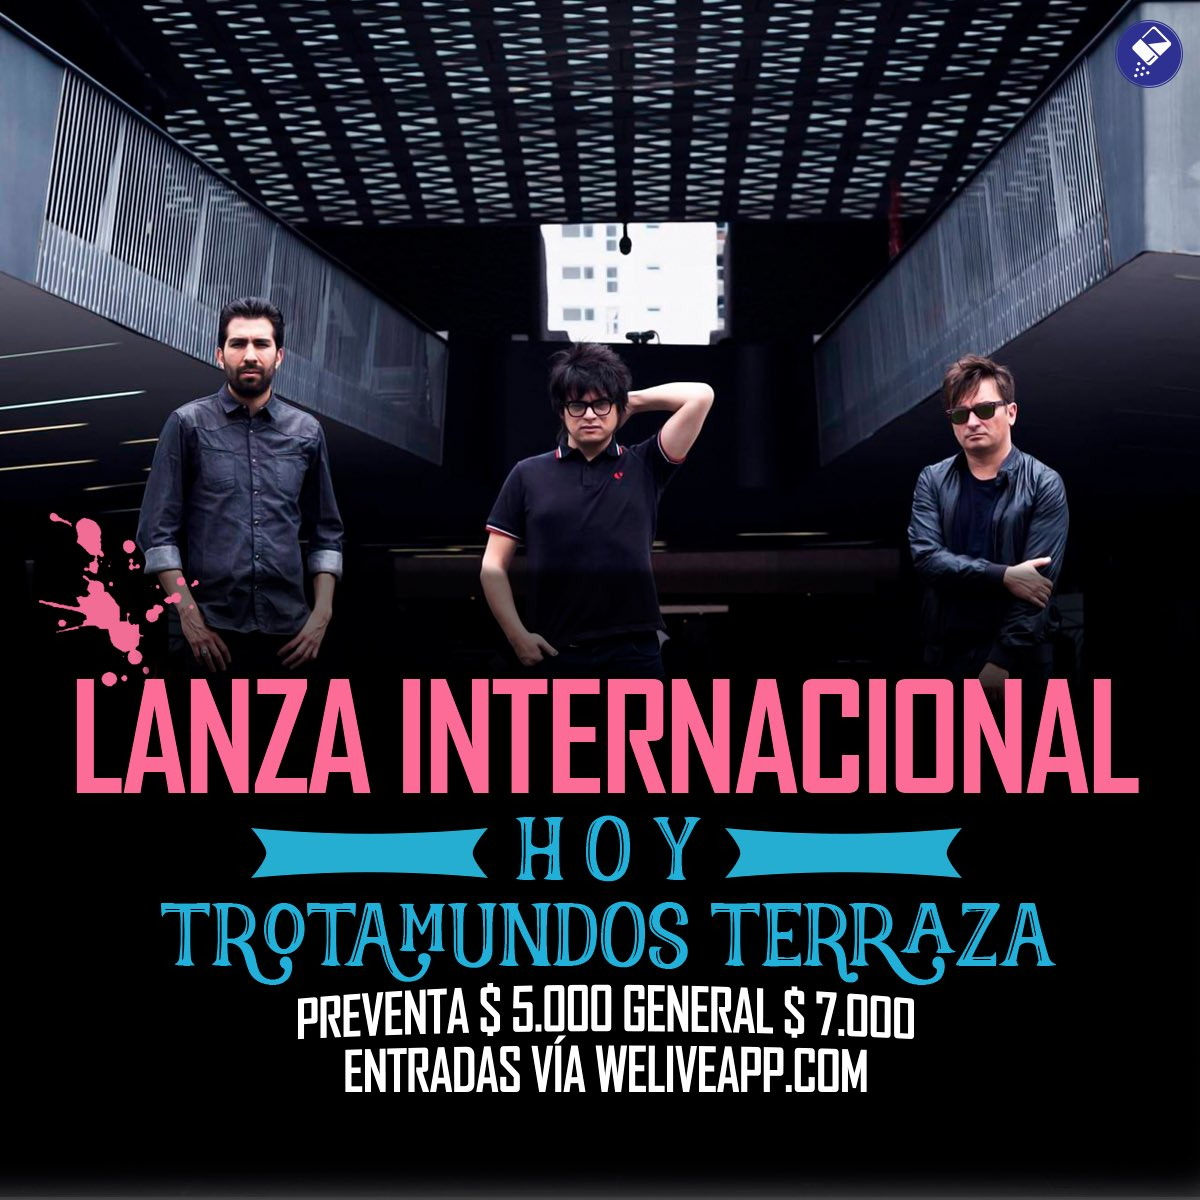 Trotamundos Terraza On Twitter Hoy Lanzainternacional